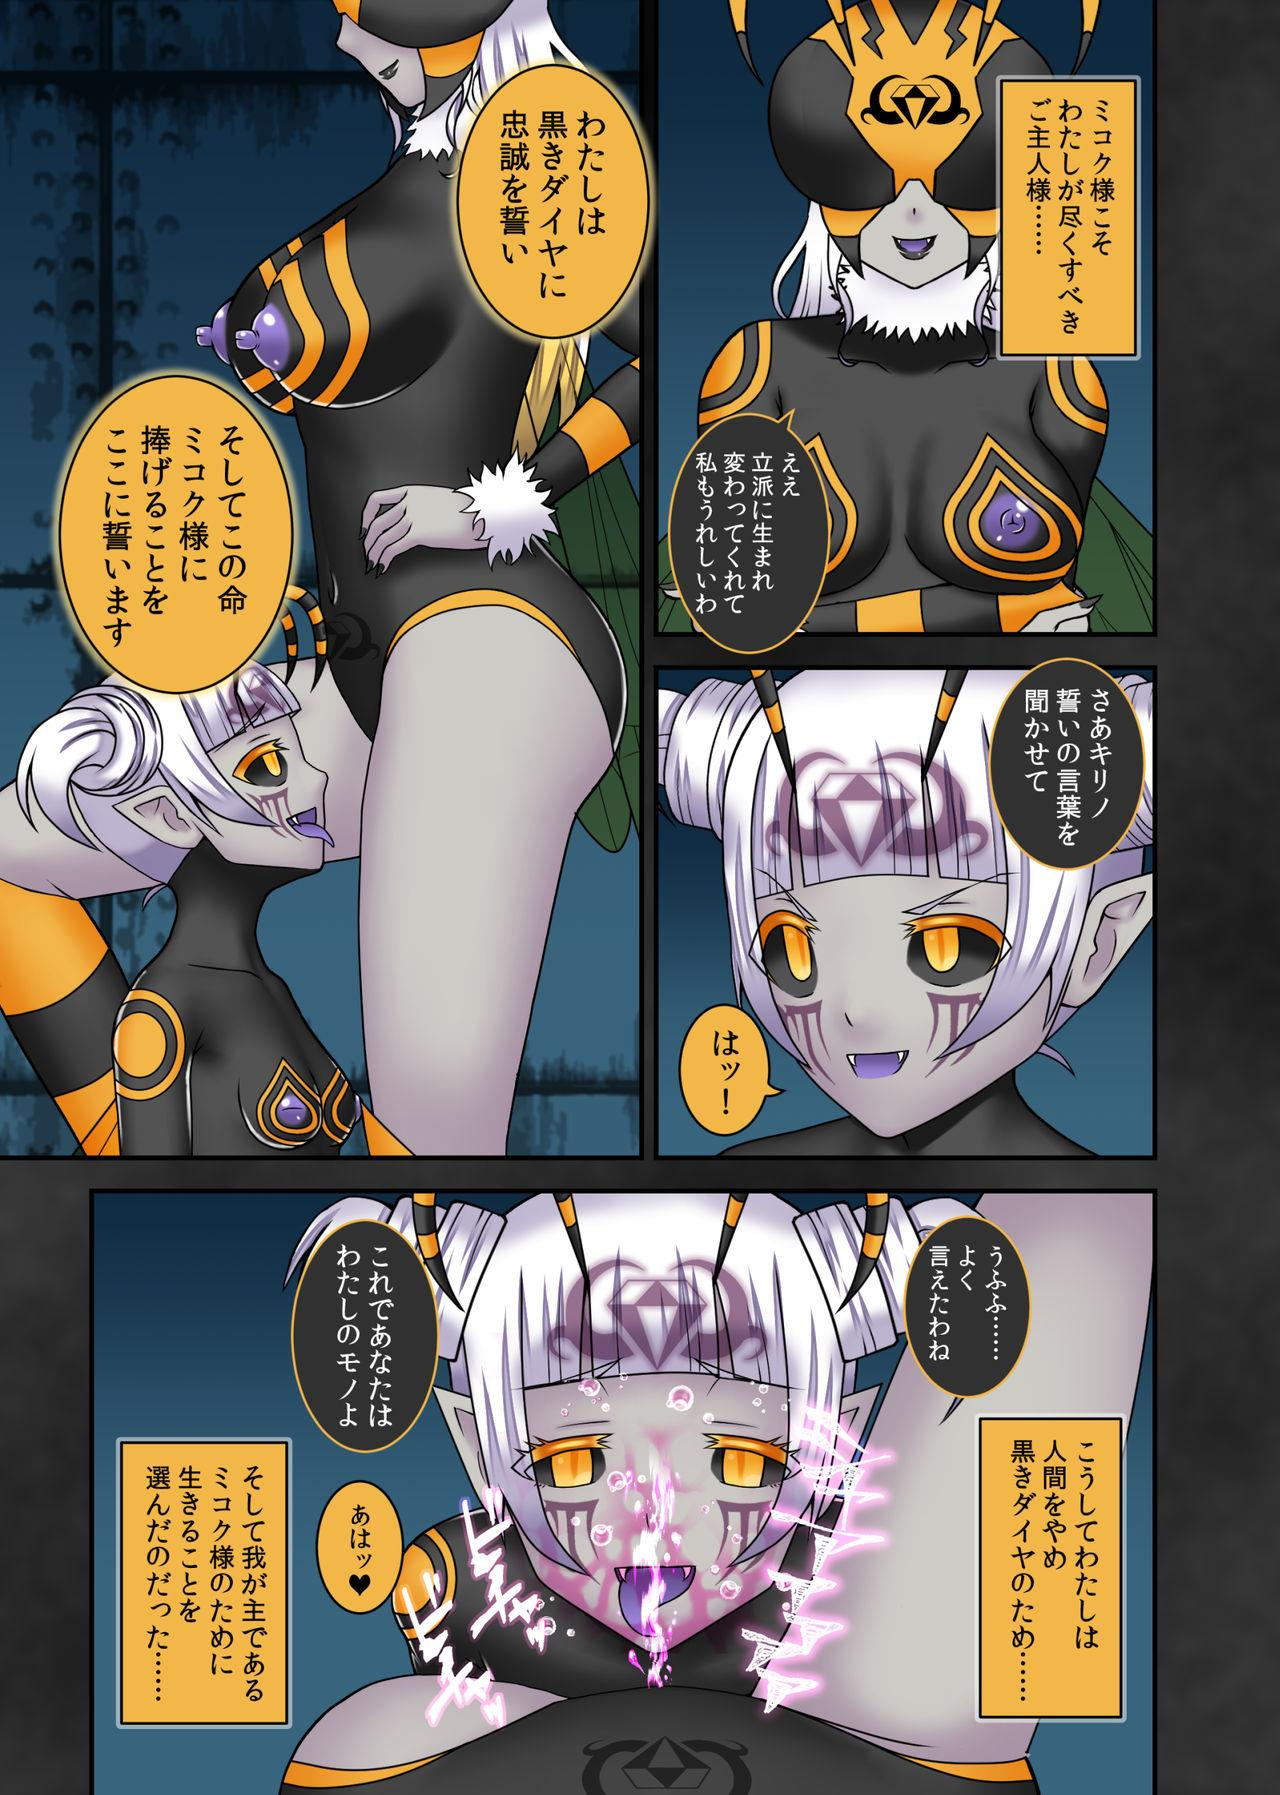 [STUDIO HP+ (IceLee)] Teisou Sentai Virginal Colors Dai-Go-wa 31